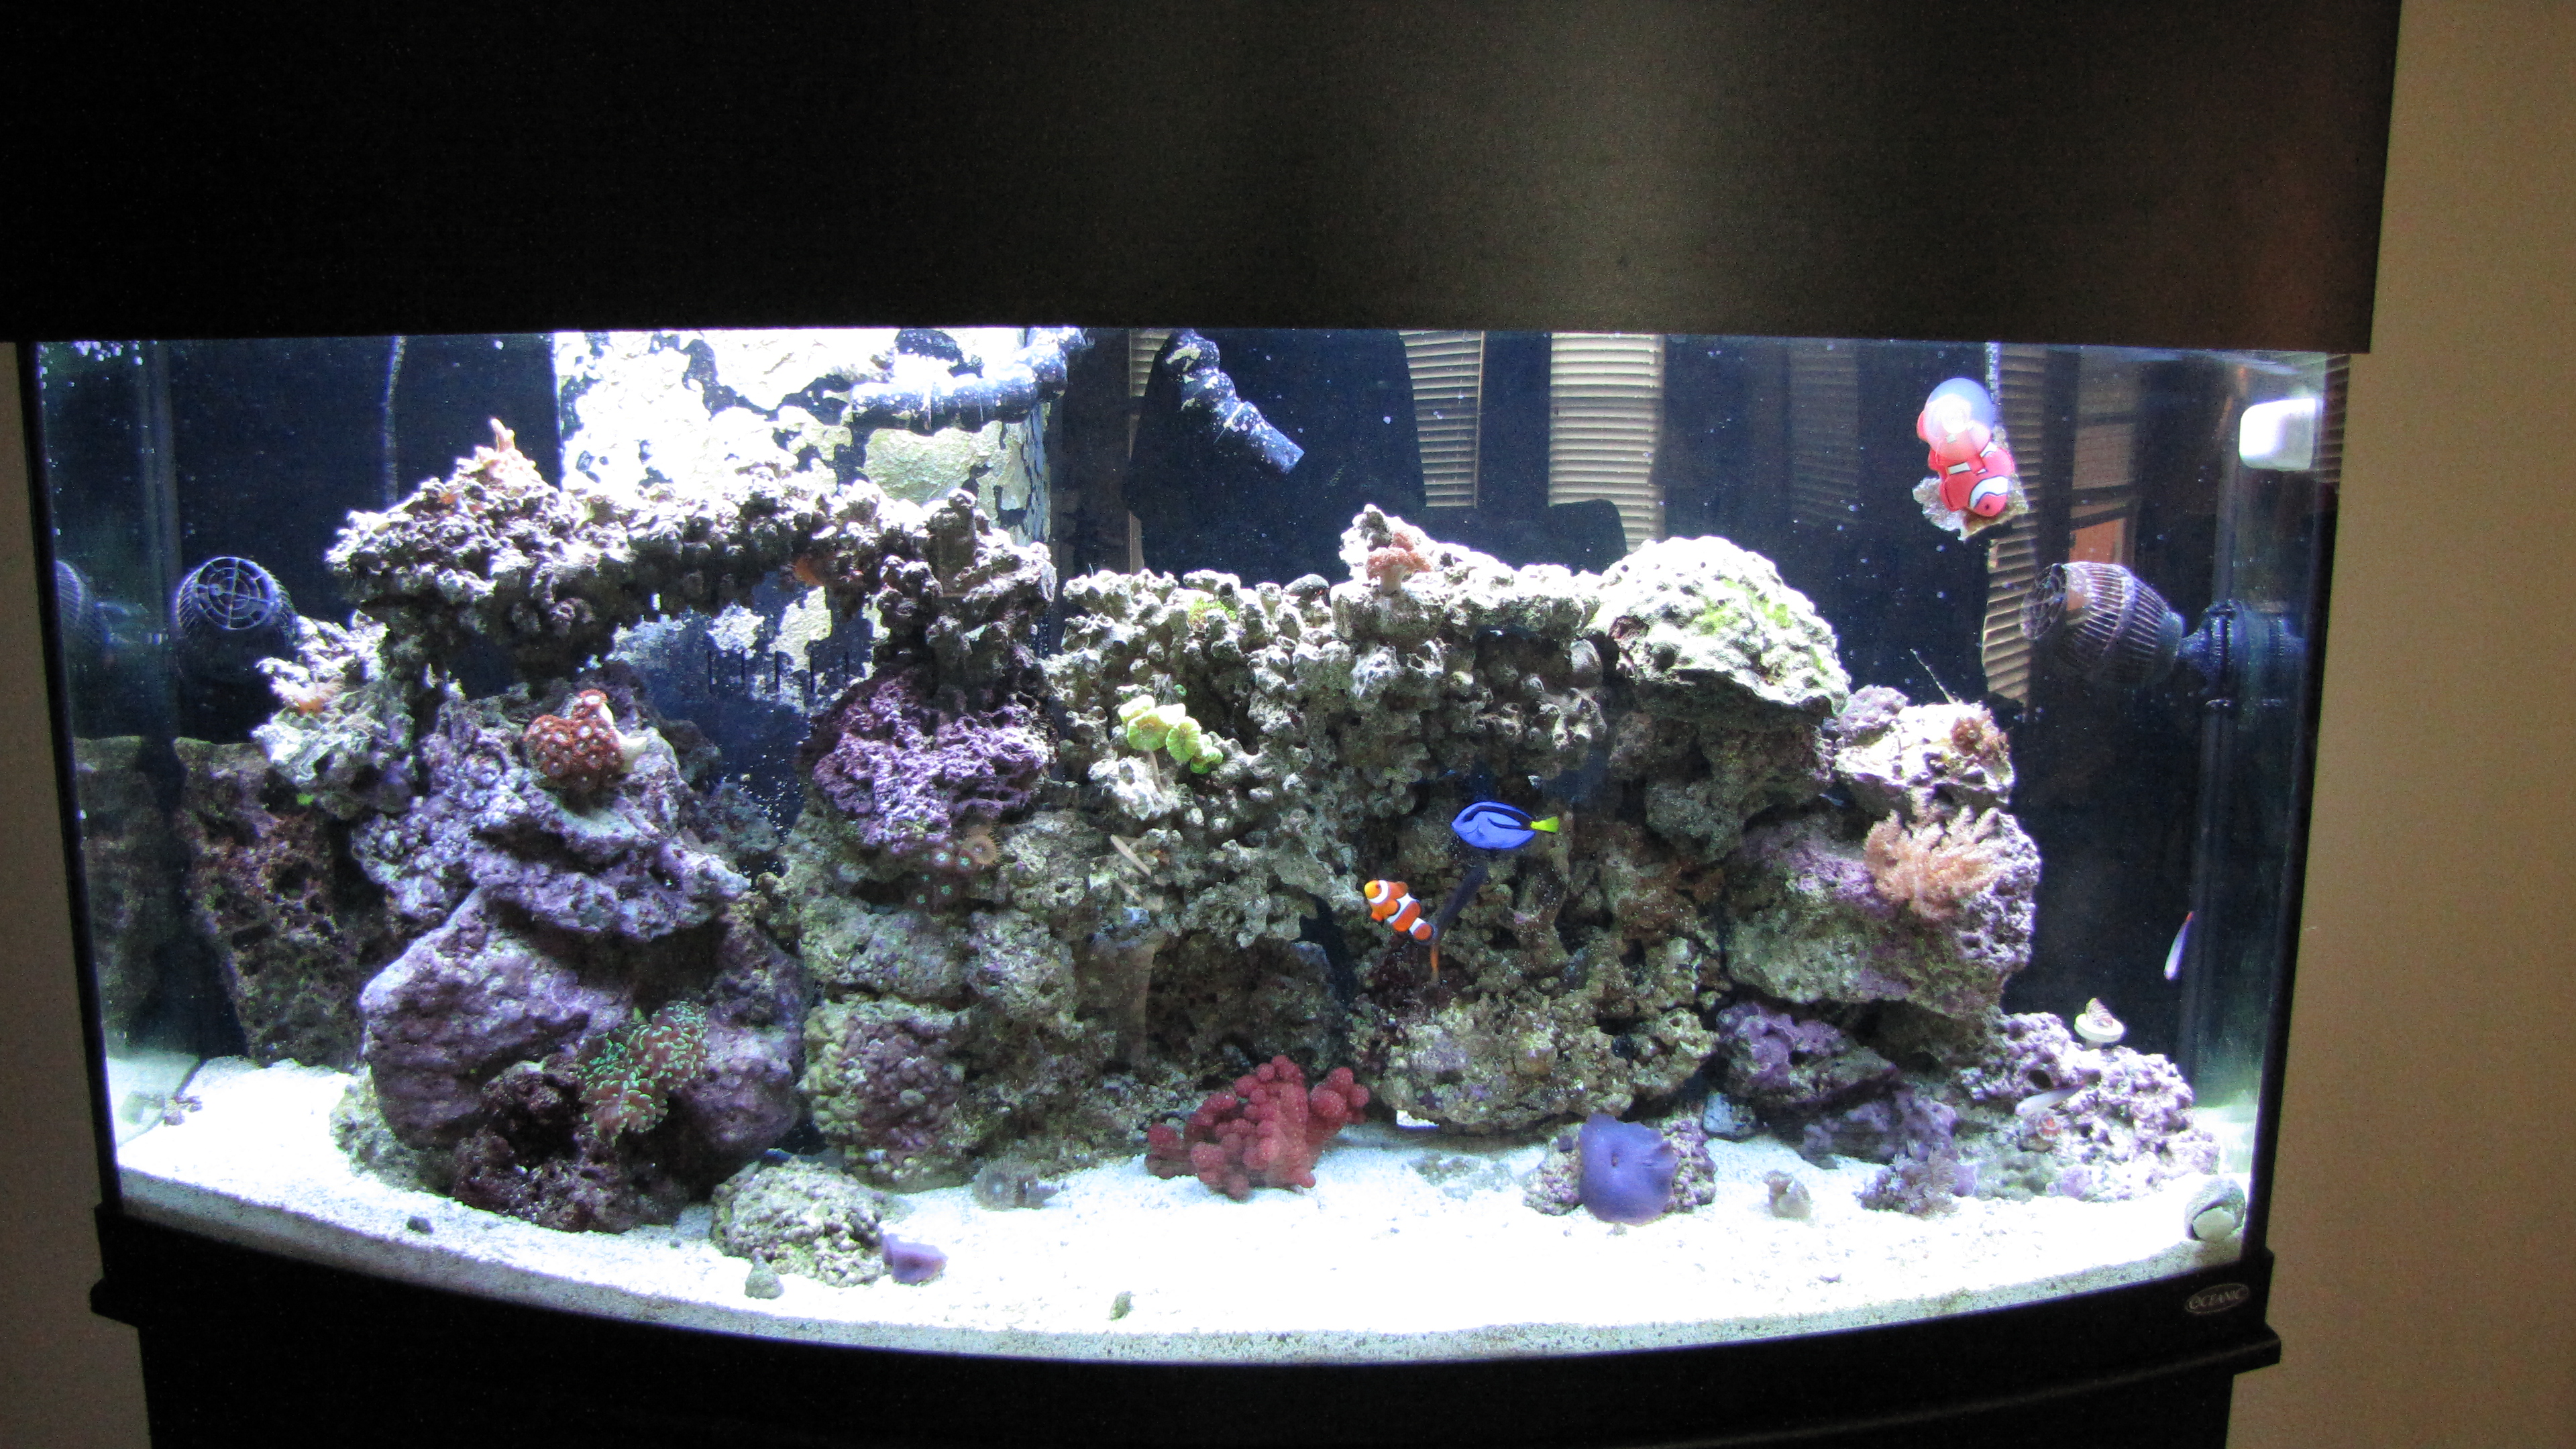 My 72 gal bowfront reef tank reef keeping austin reef club for 37 gallon fish tank